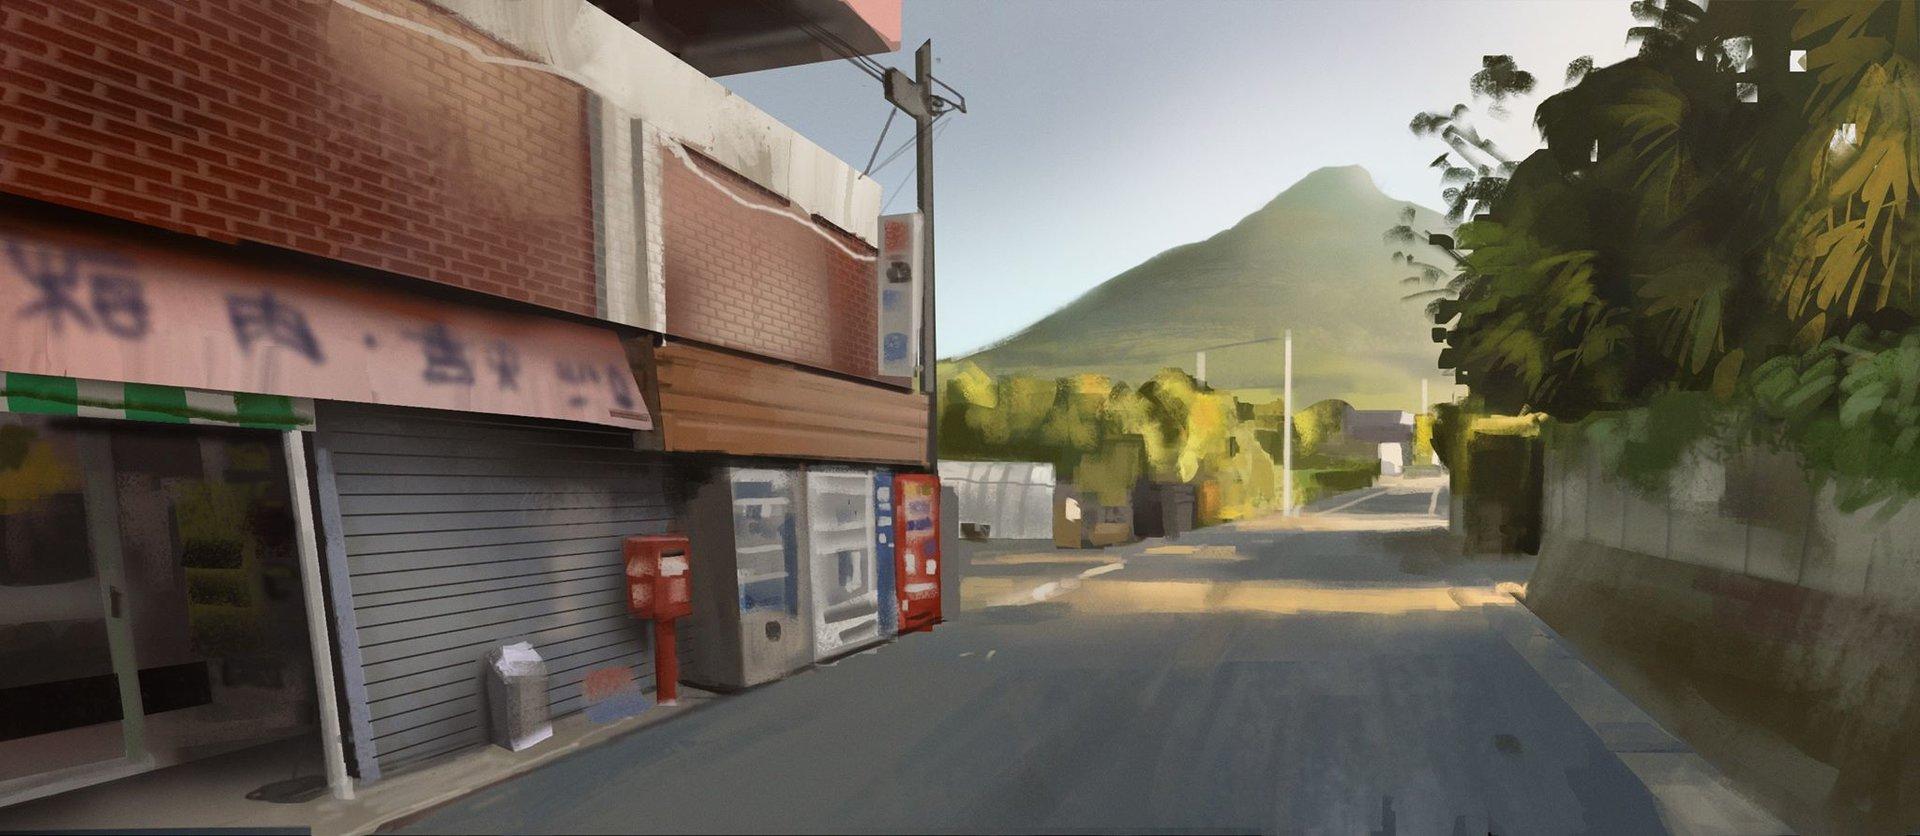 Adrien girod japan study street